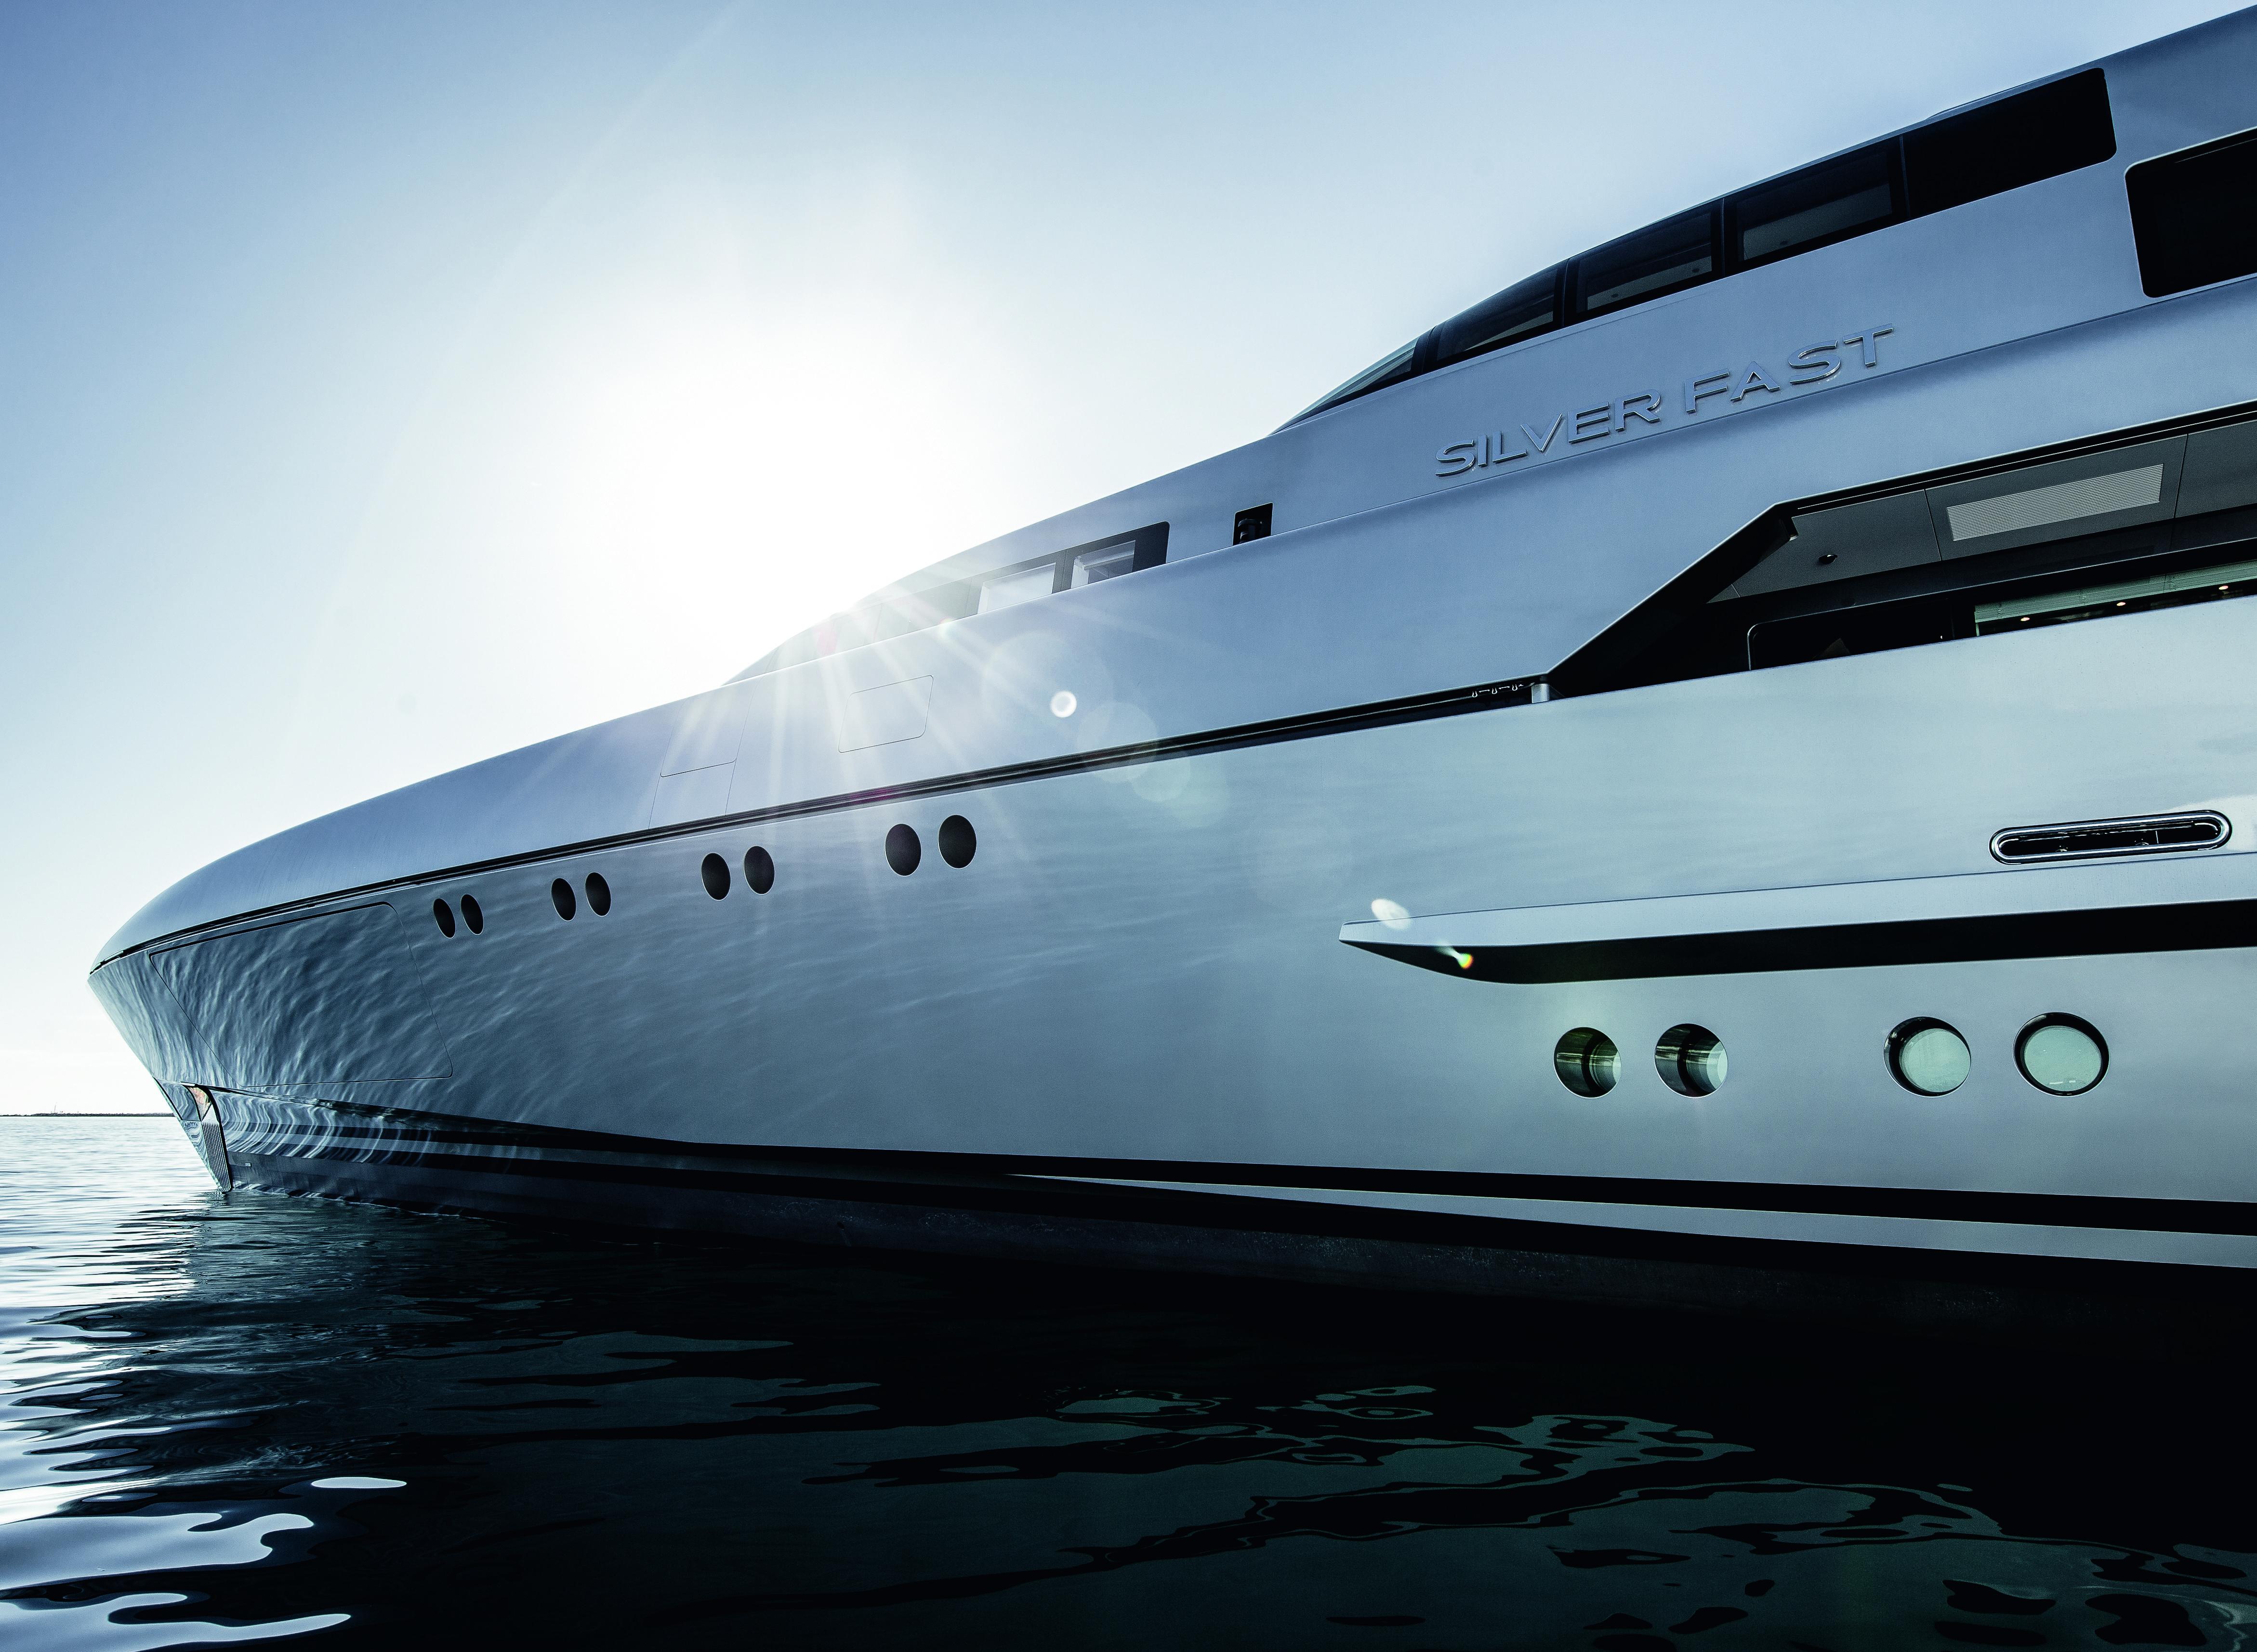 THE BLACKBOOK: Spotlight on the Monaco Yacht Show 2015